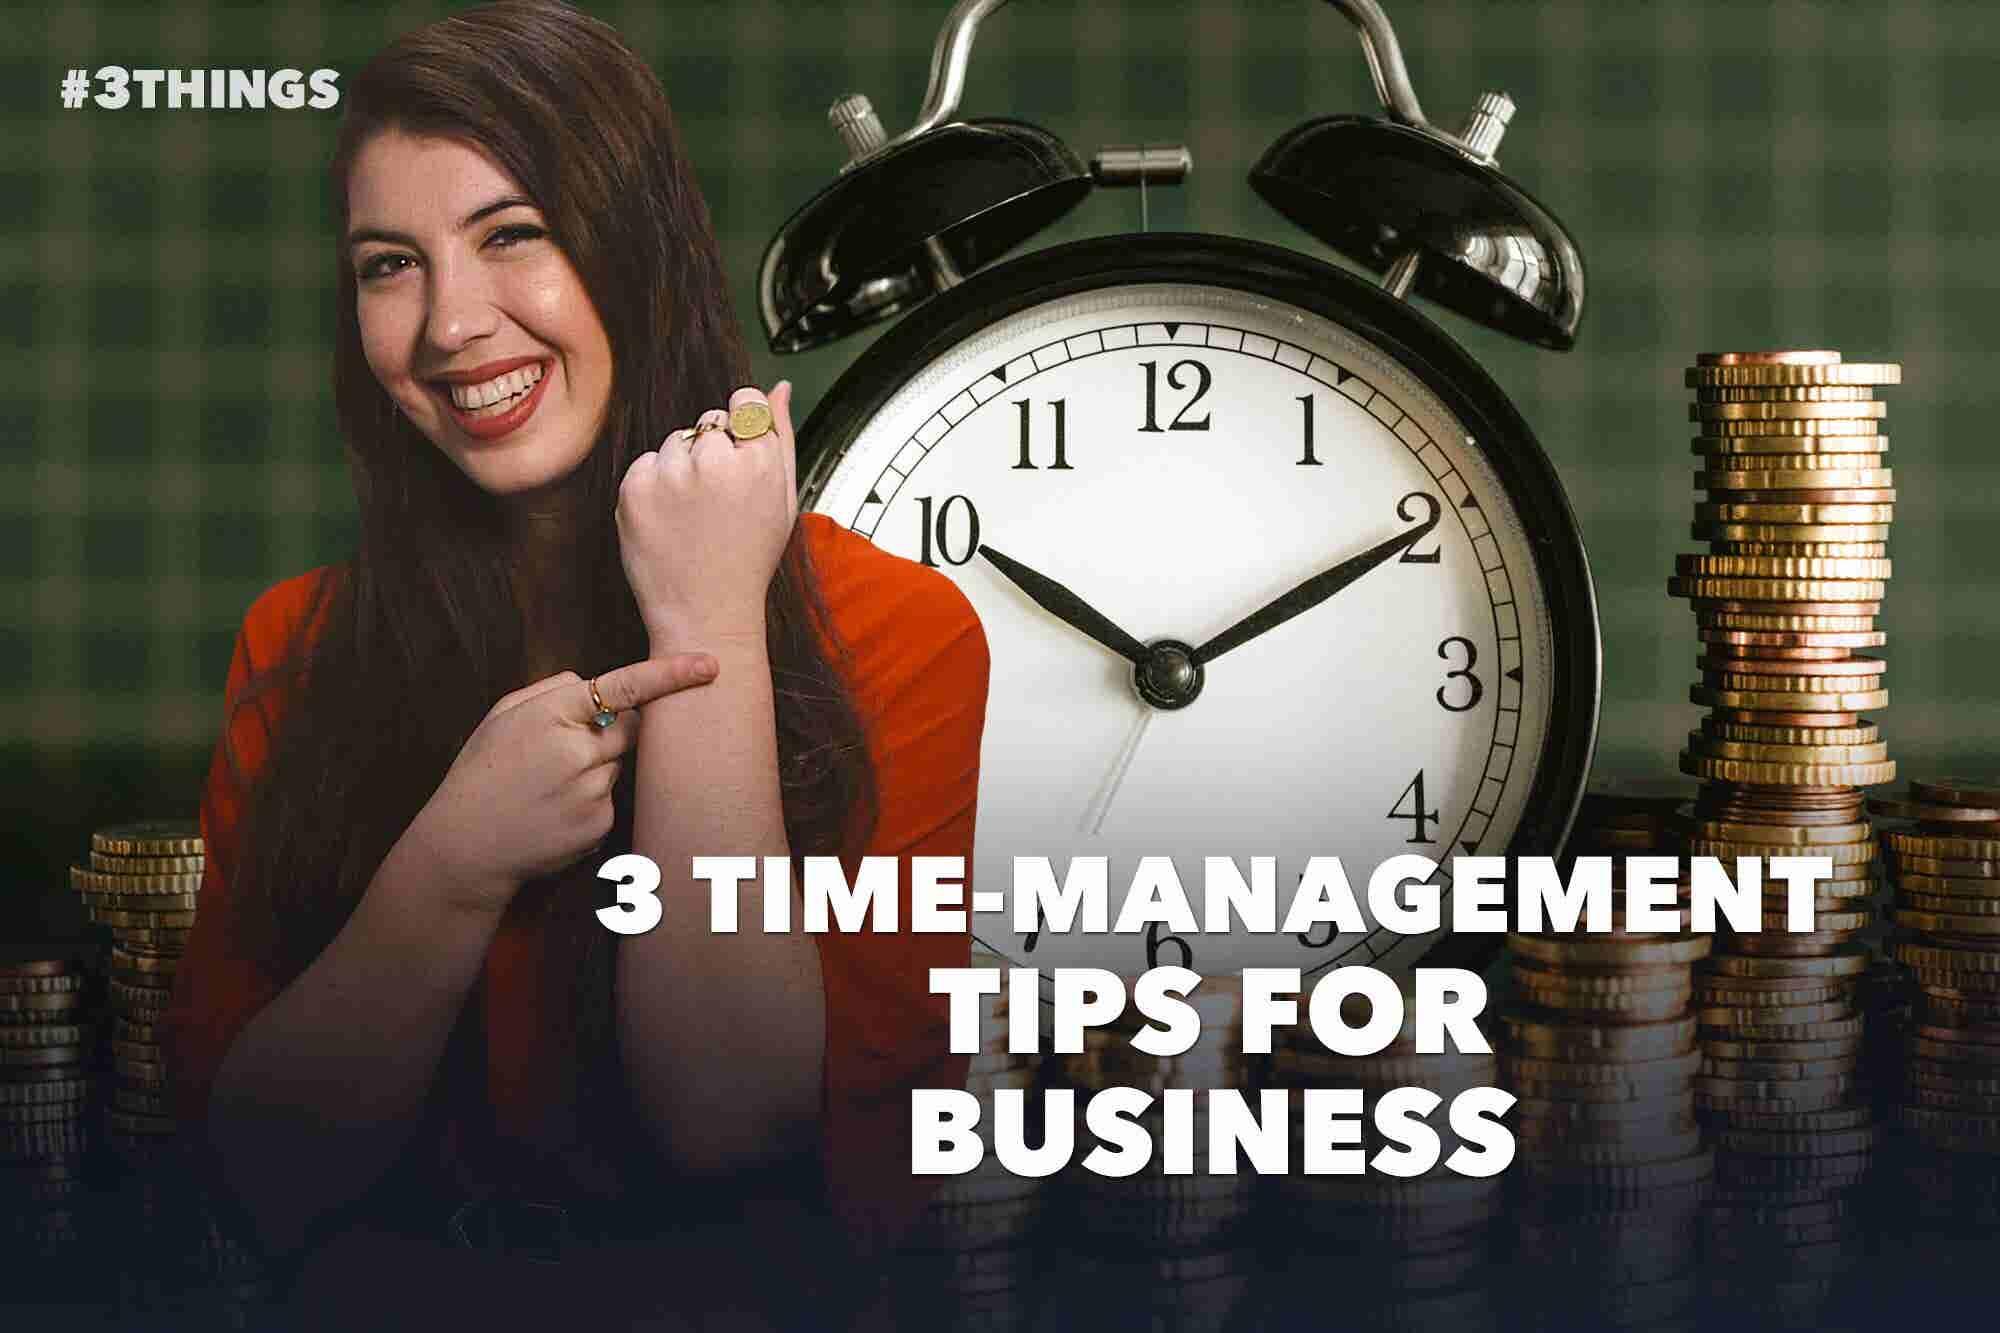 3 Time-Management Tips for Entrepreneurs (60-Second Video)